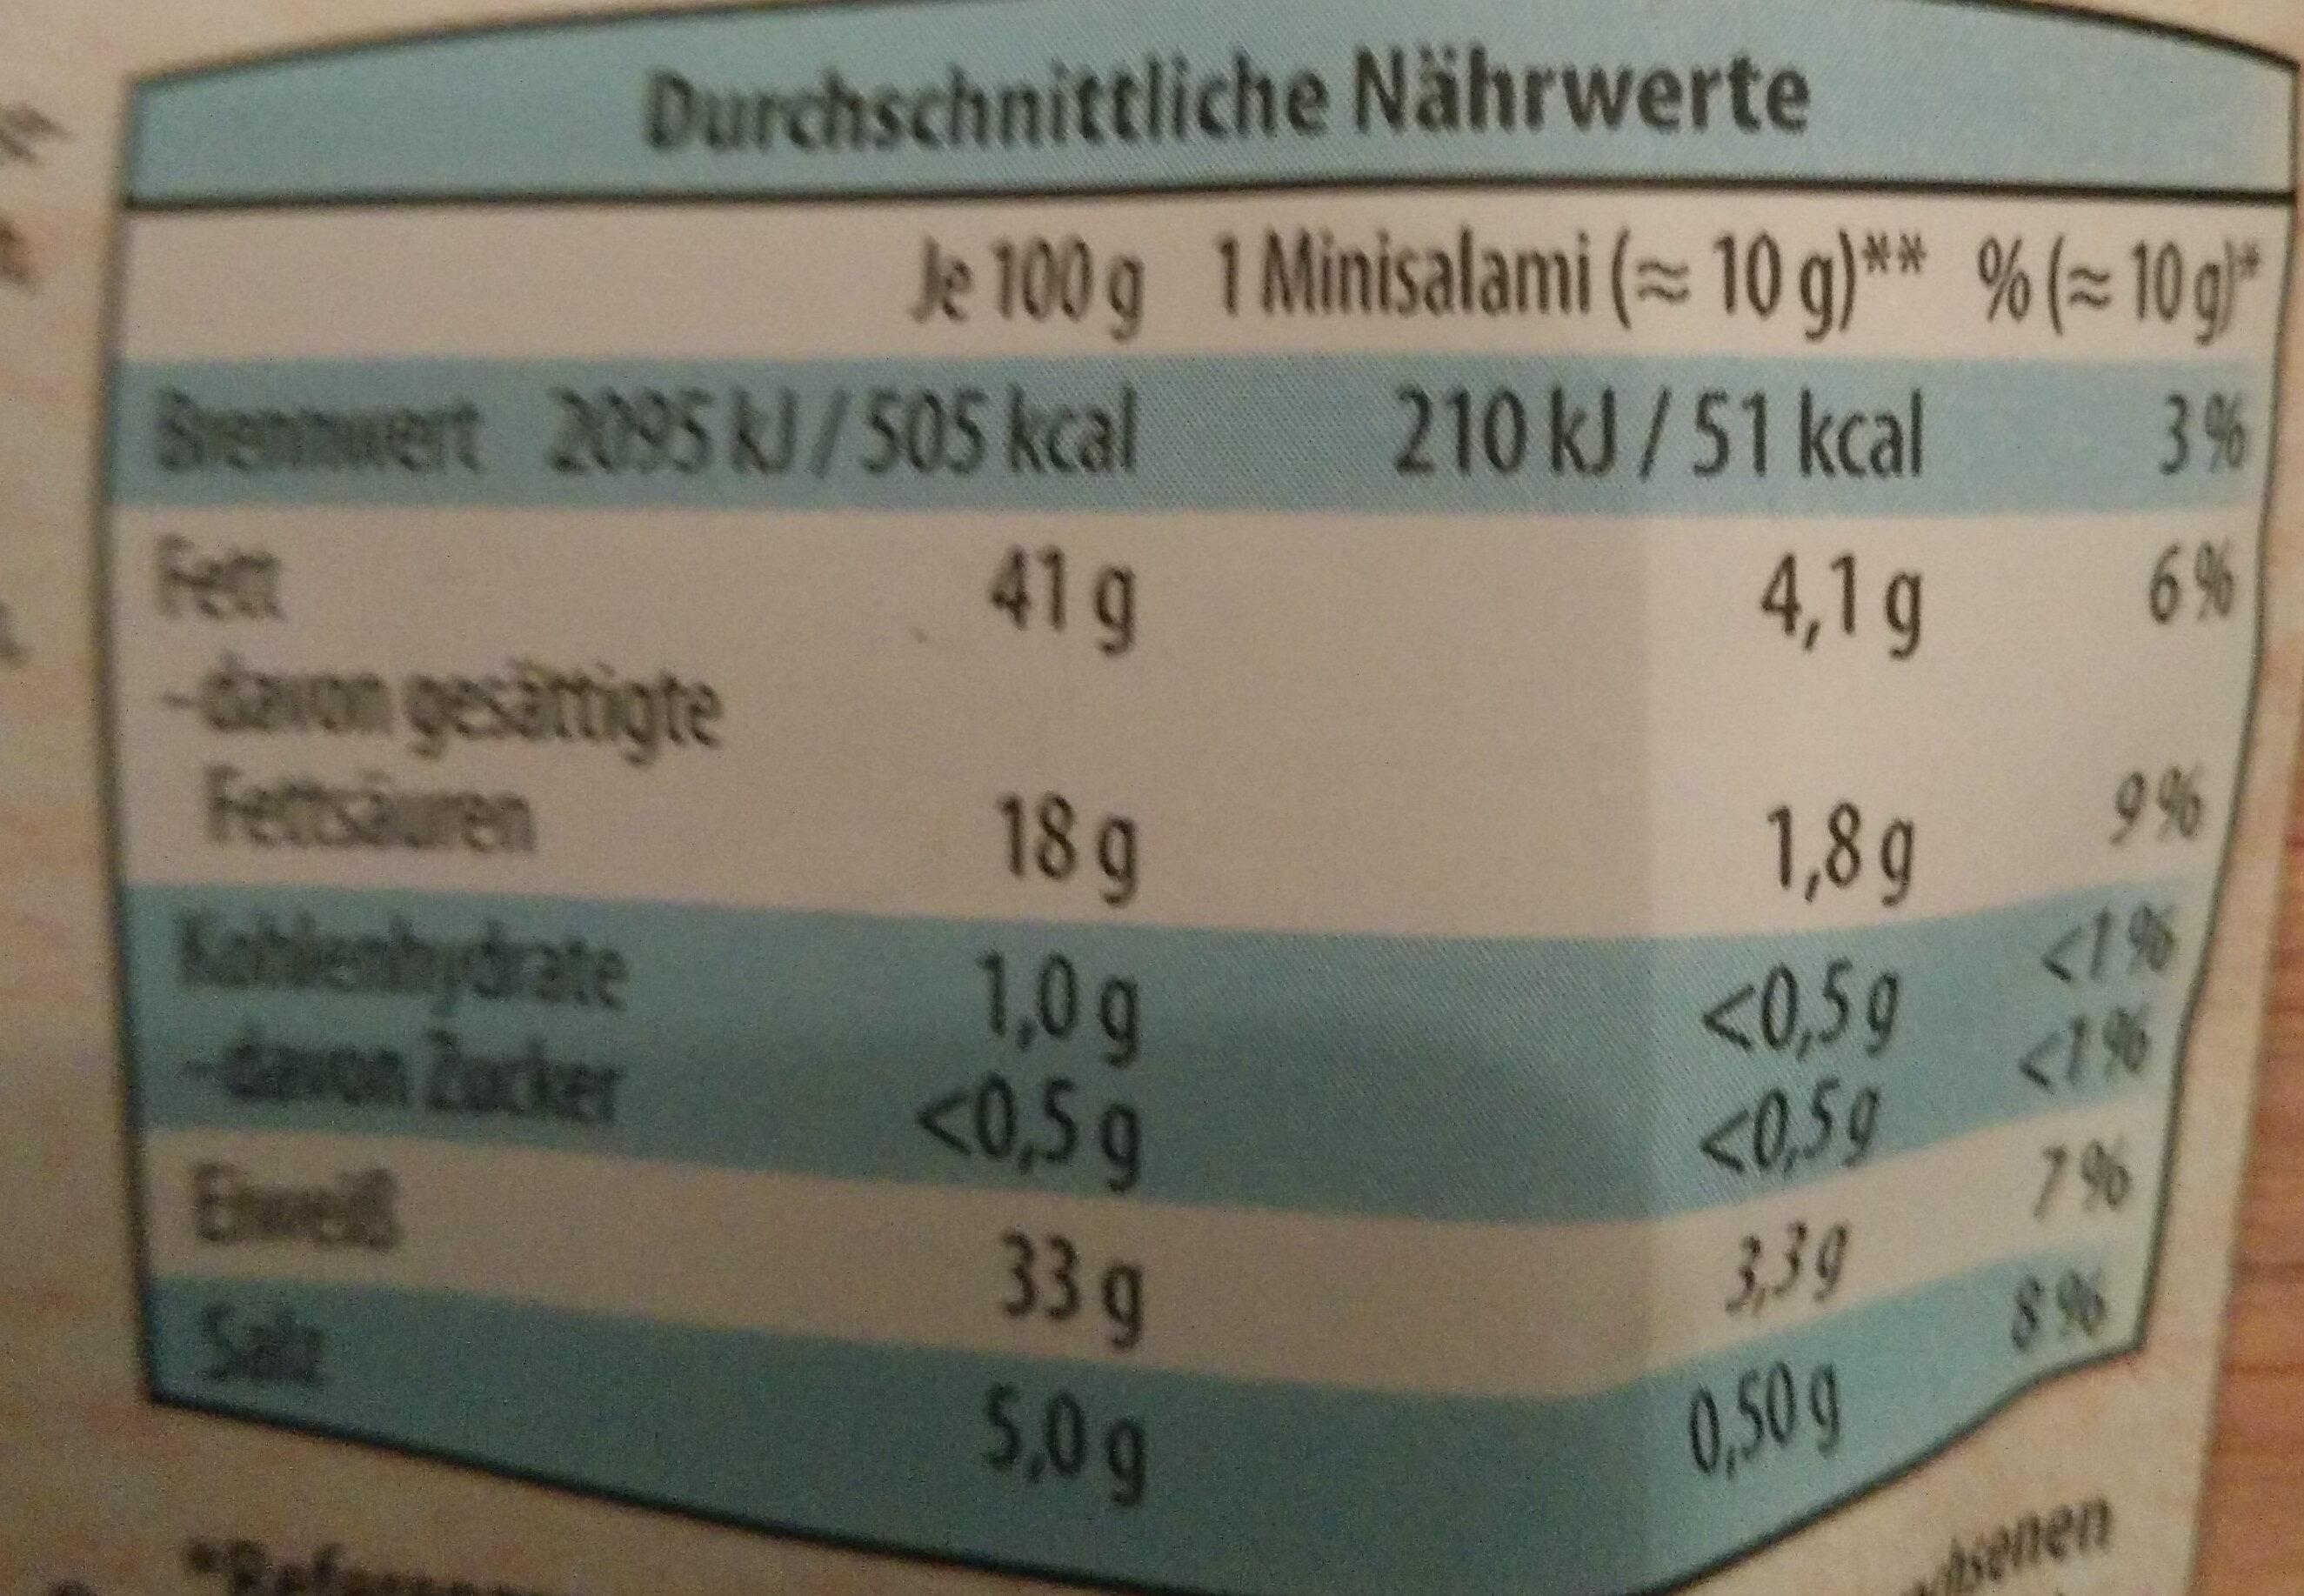 Salametti Minisalamis - Classic - Nutrition facts